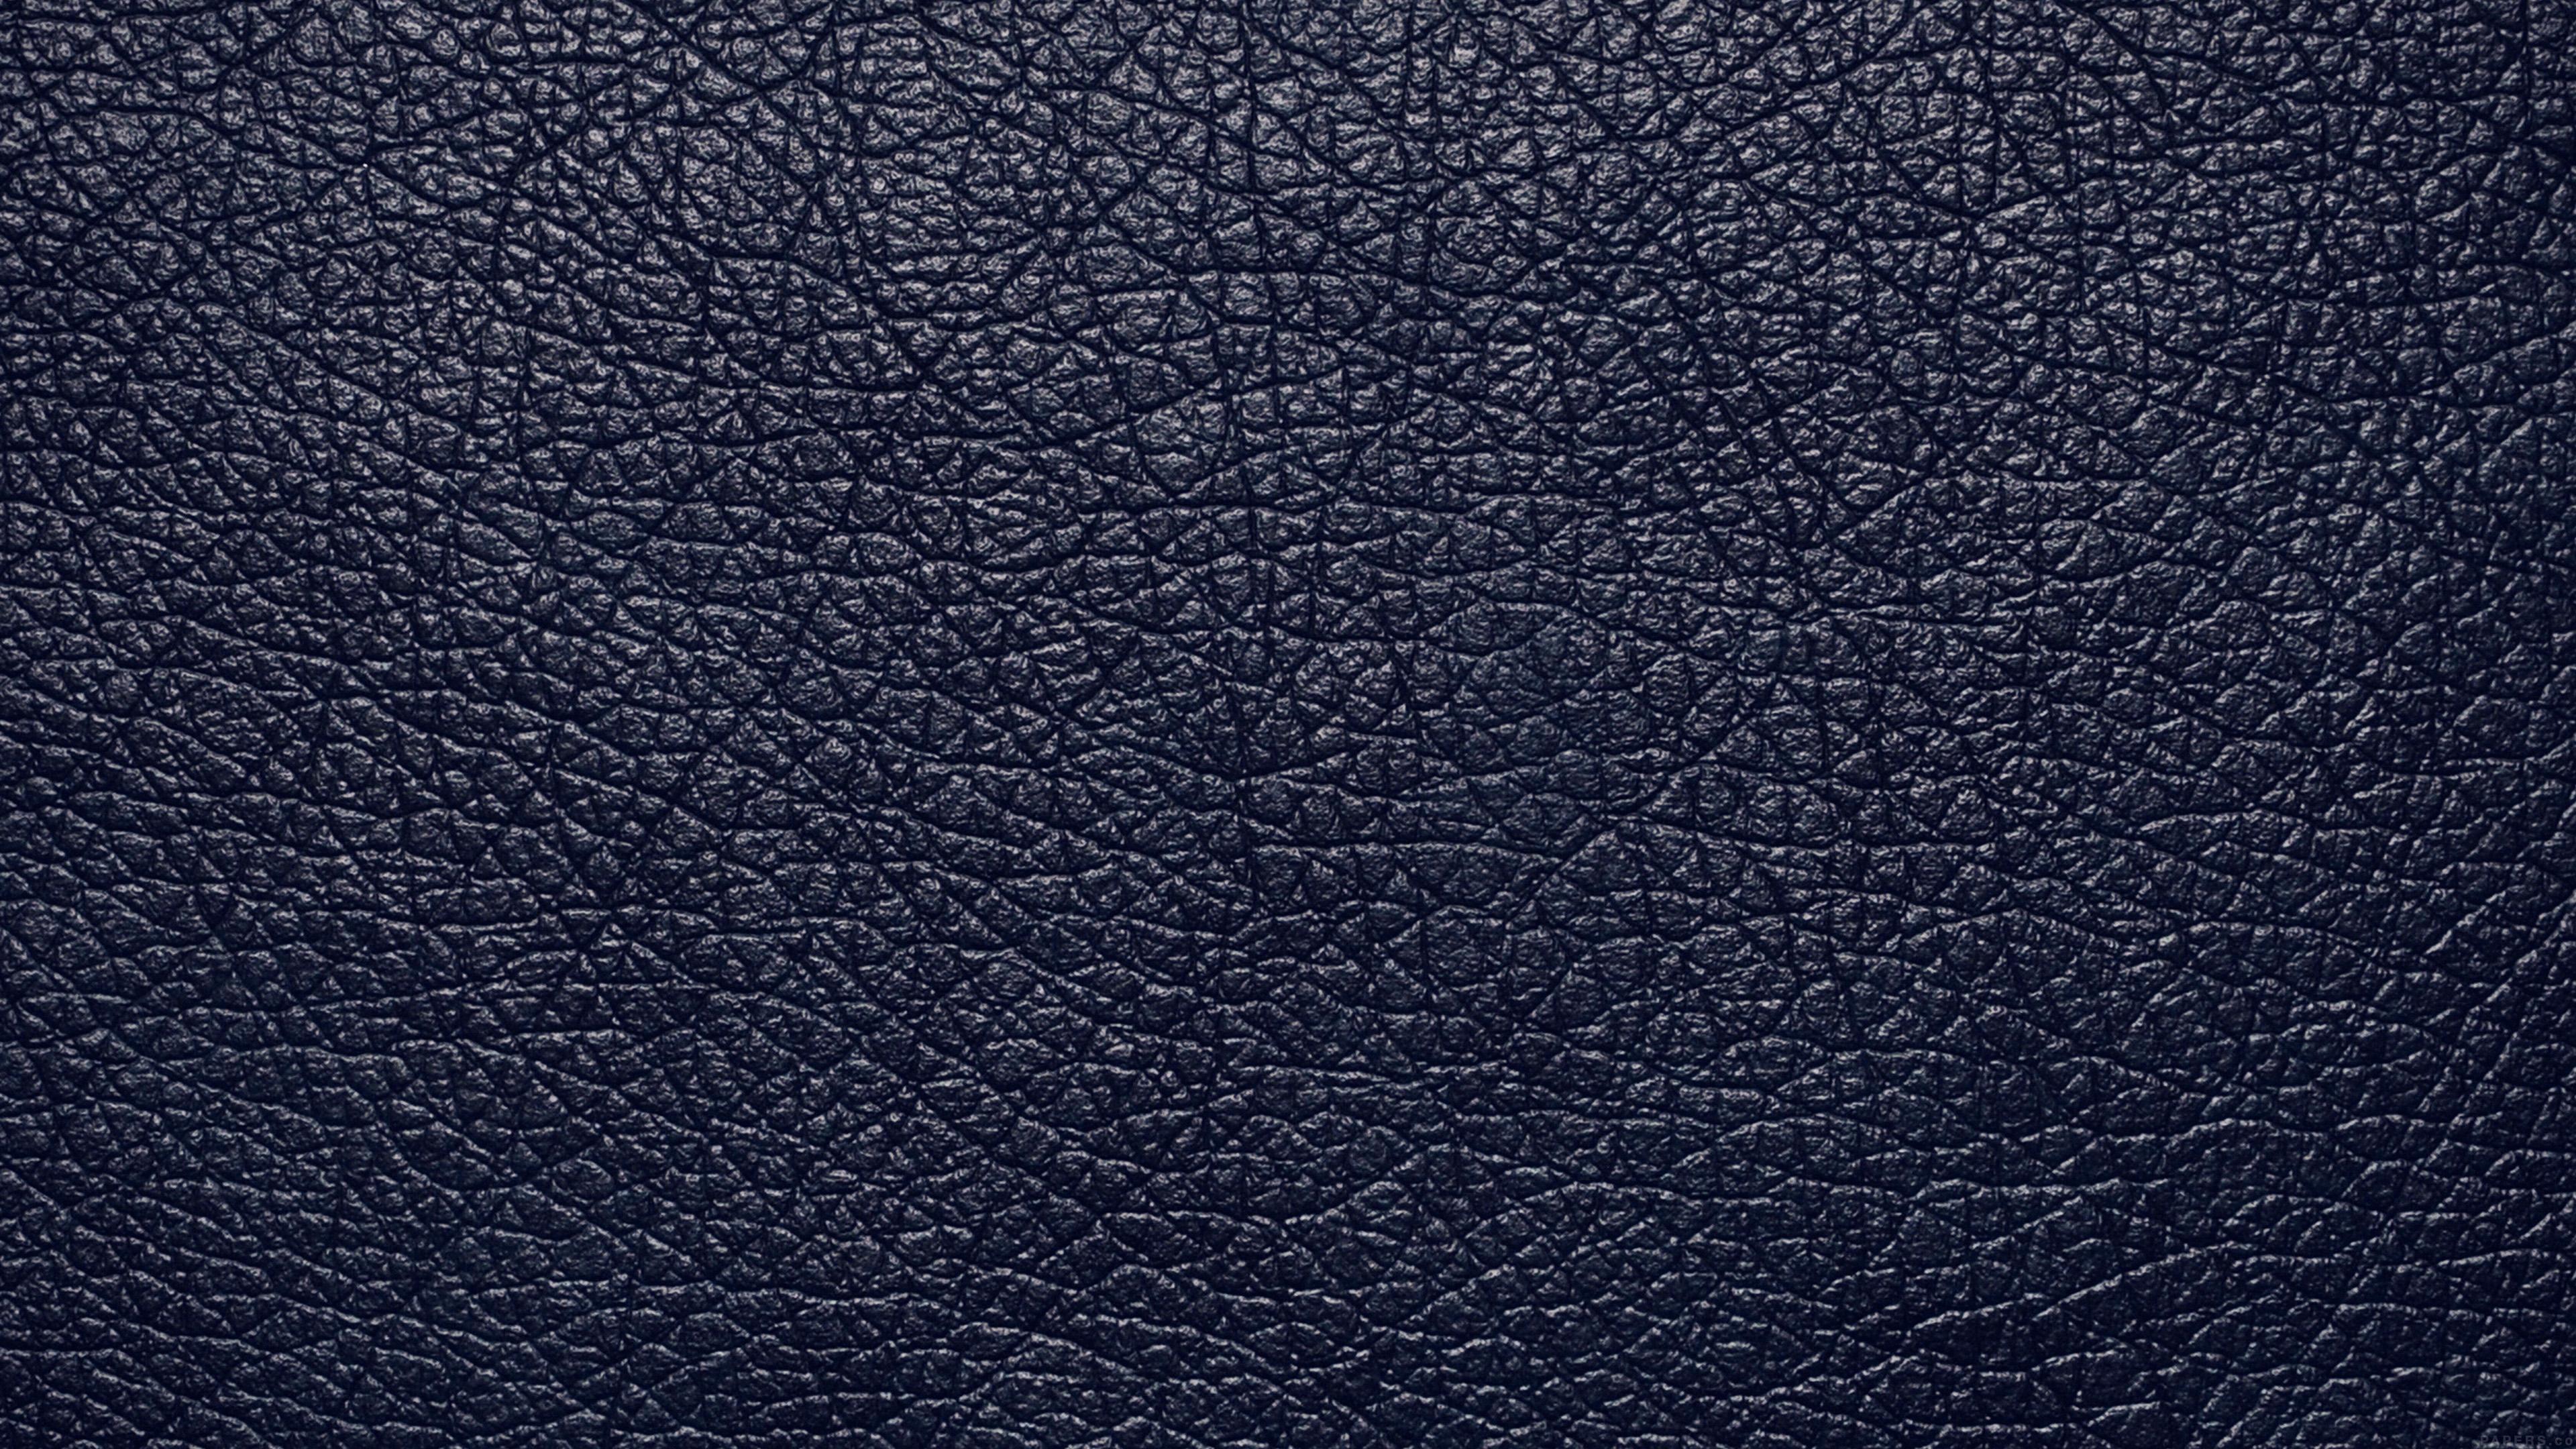 wallpaper for desktop, laptop | vi30-texture-skin-blue ...